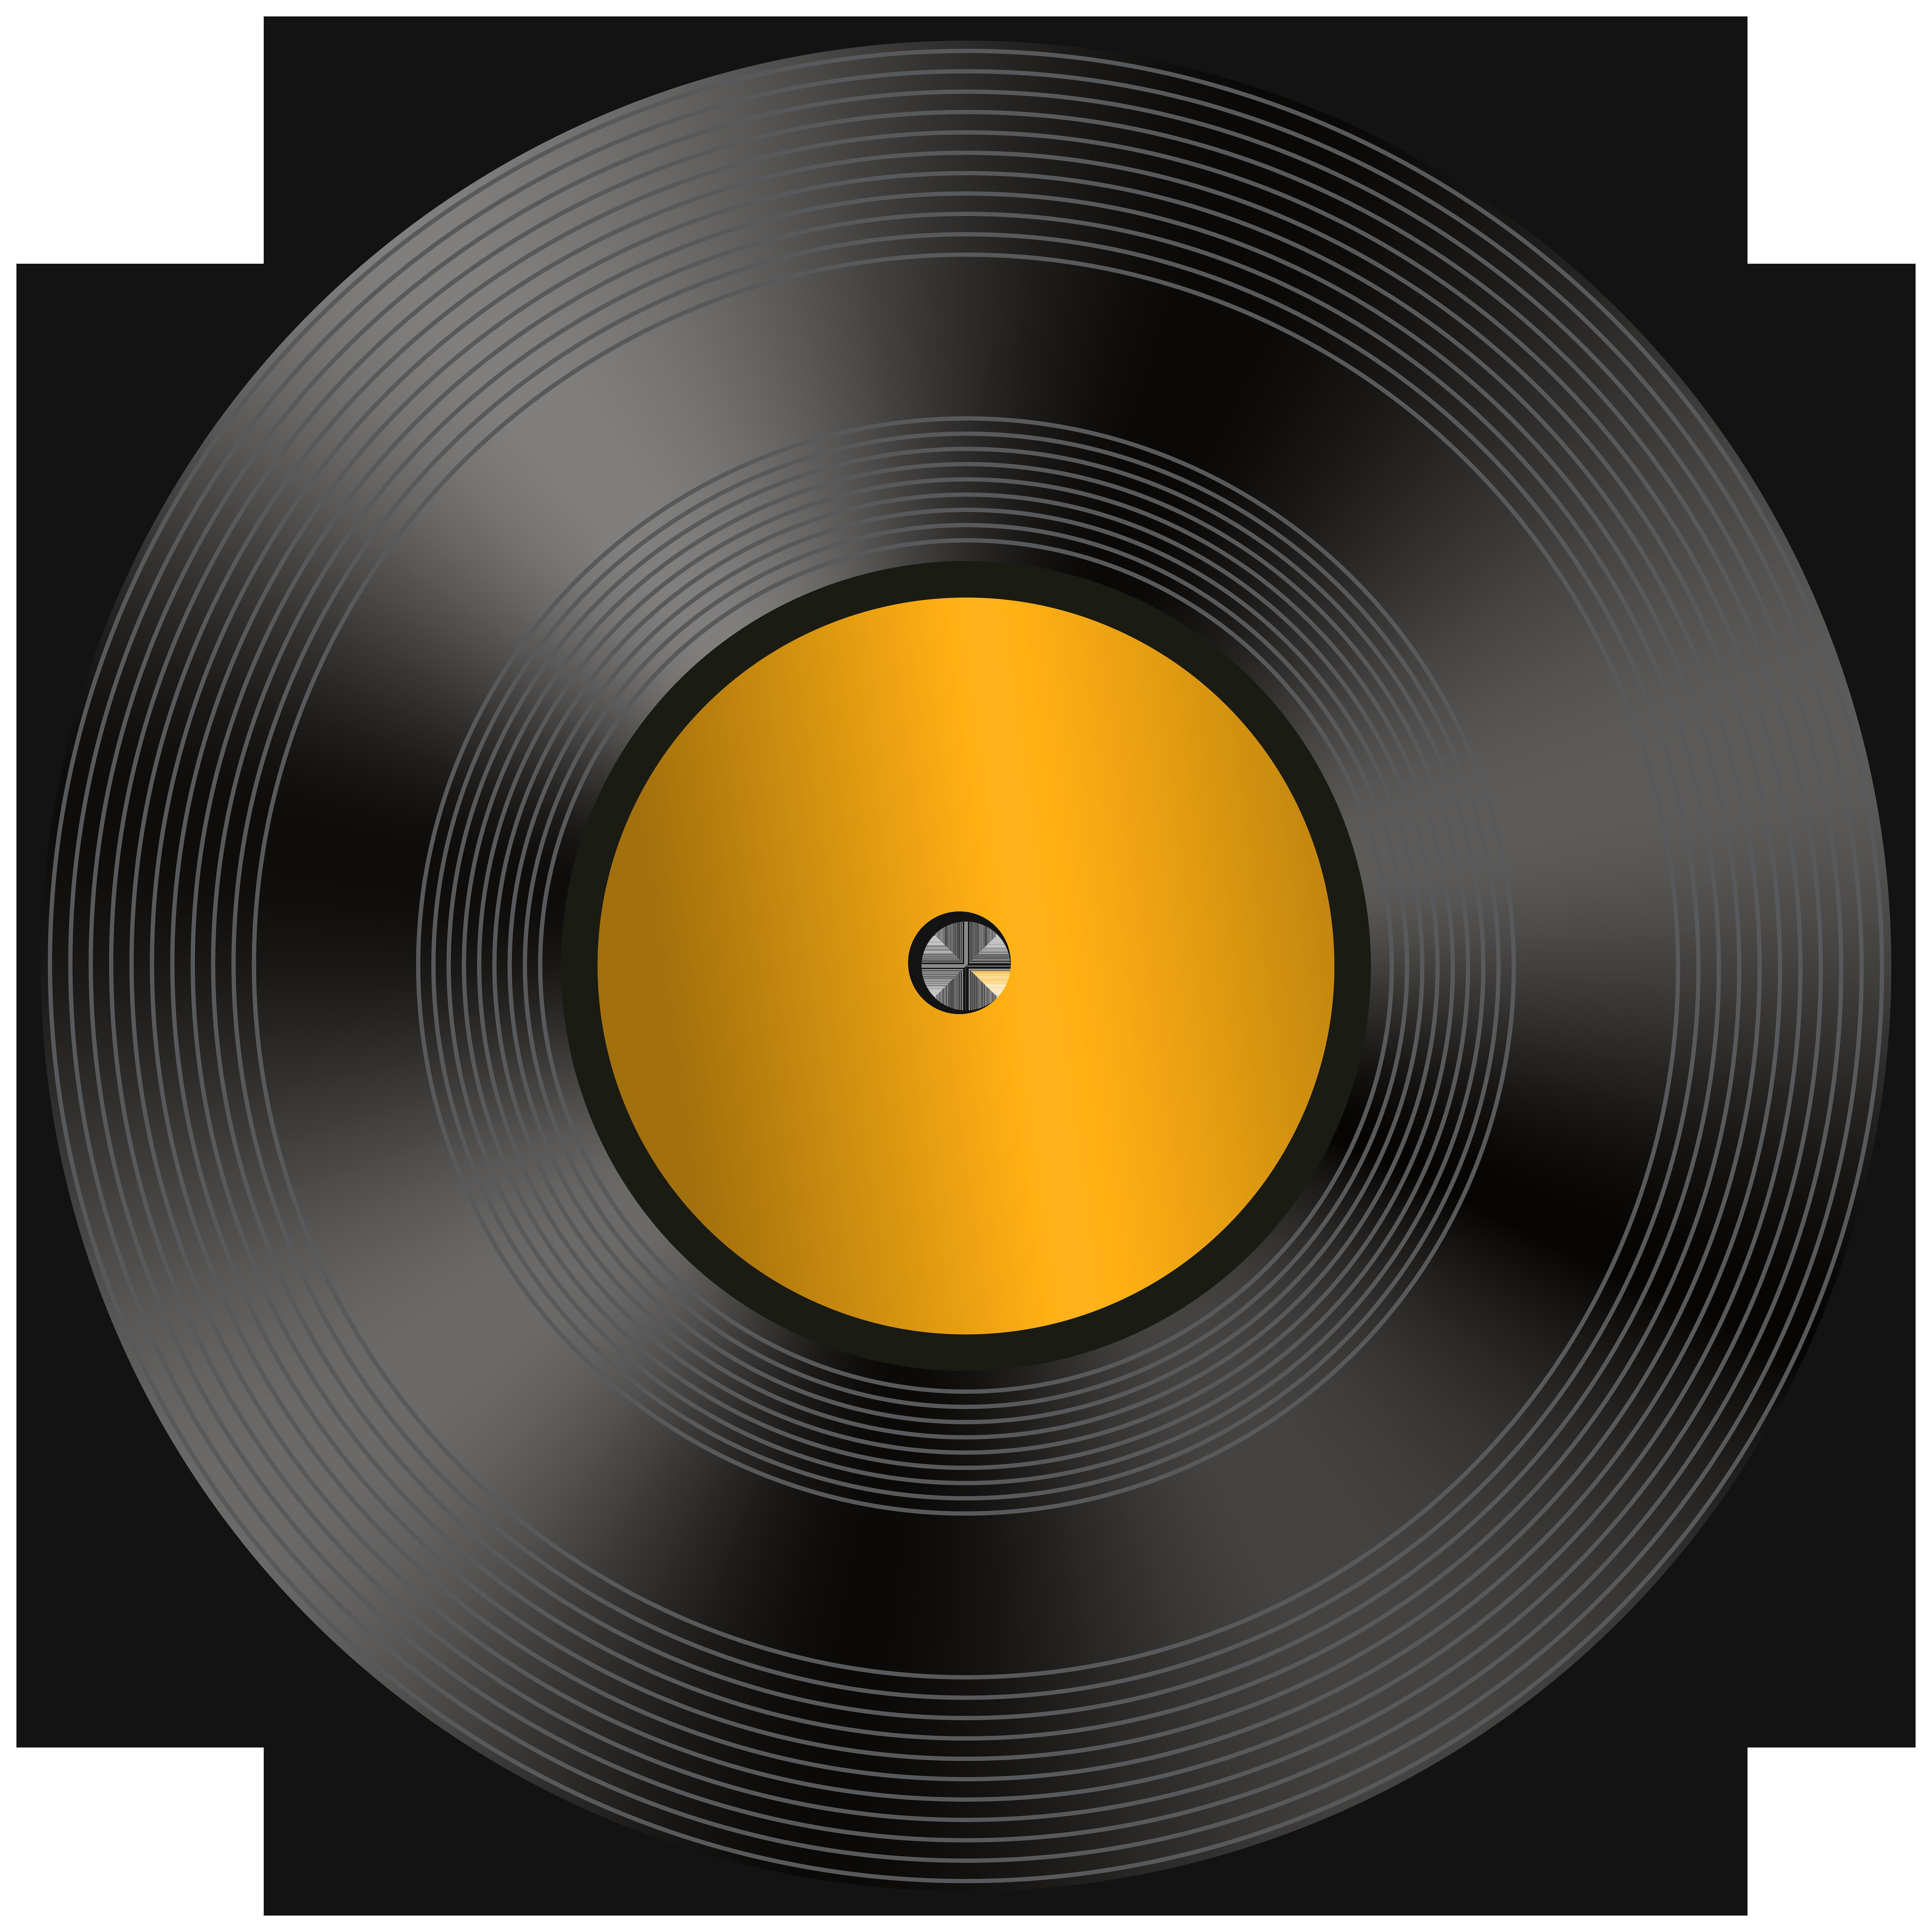 818 Record free clipart.